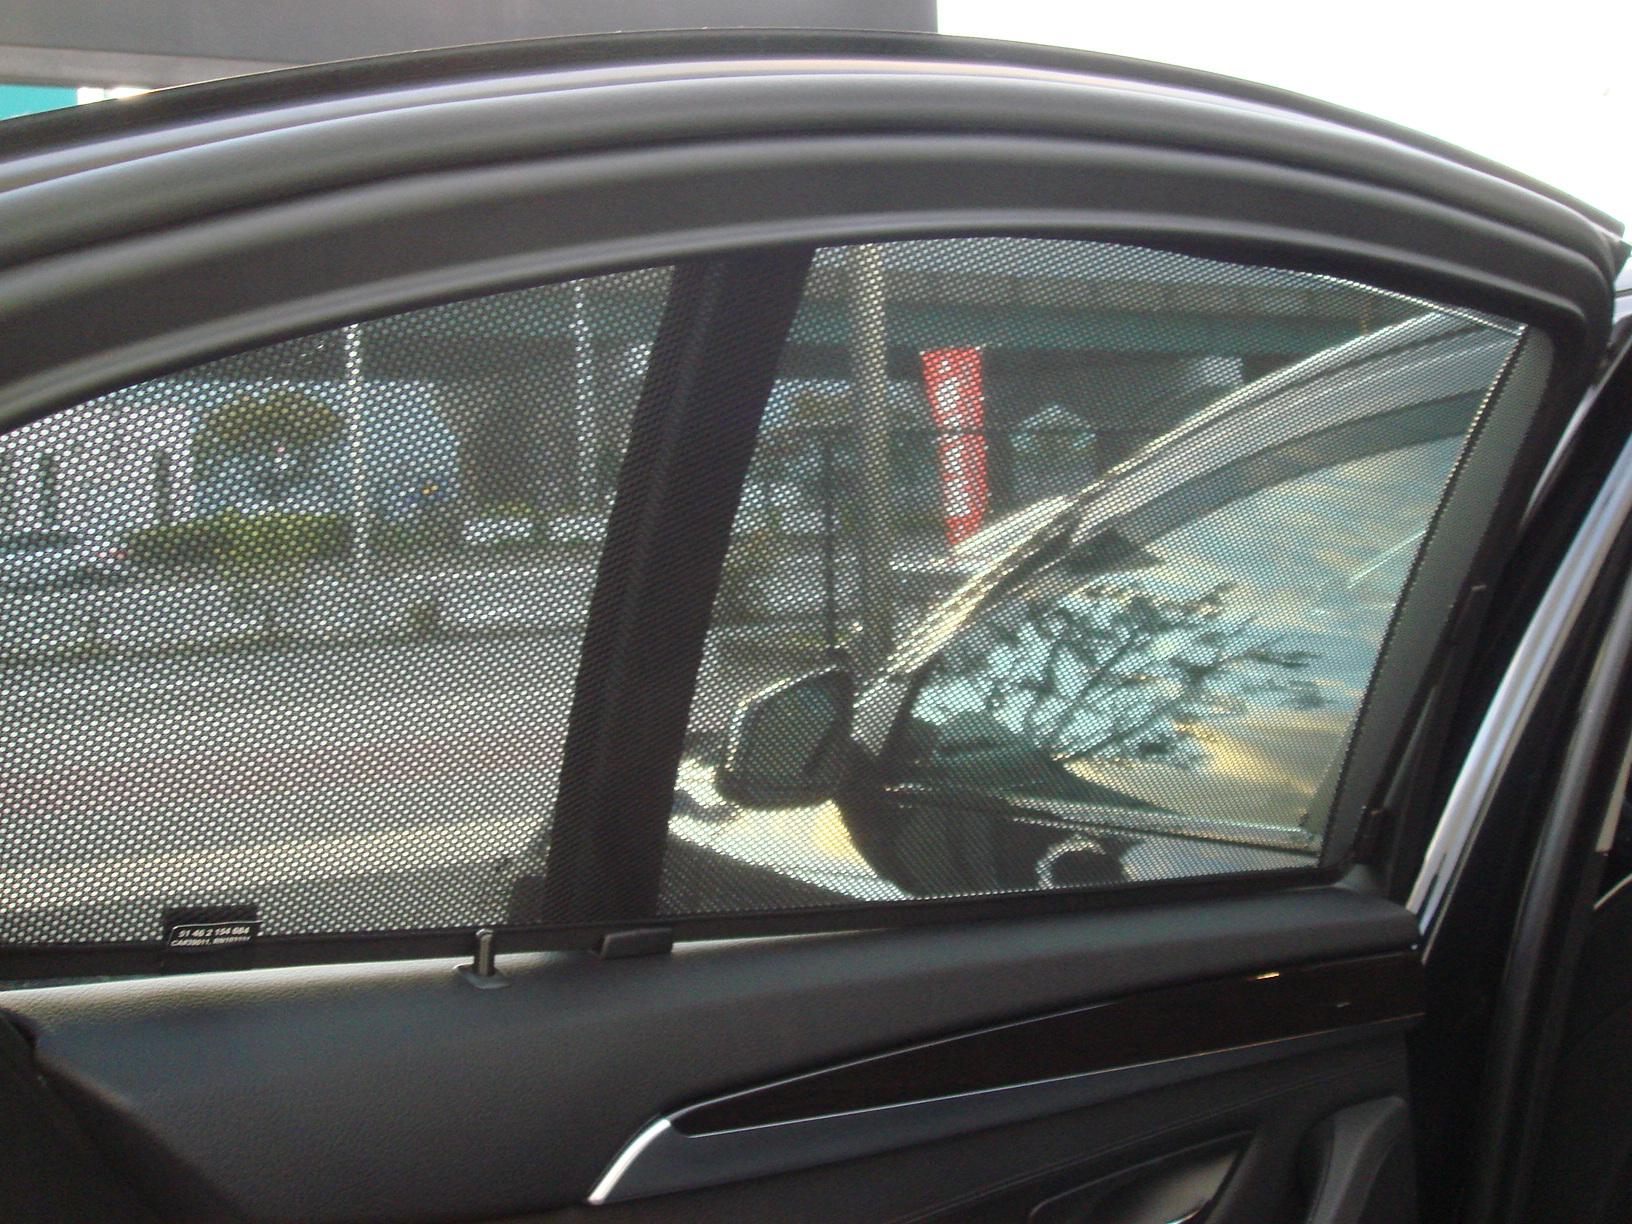 BMW 523iBEAMコンプリートカー ワンオーナー サンルーフ ブラックレザー車両画像13